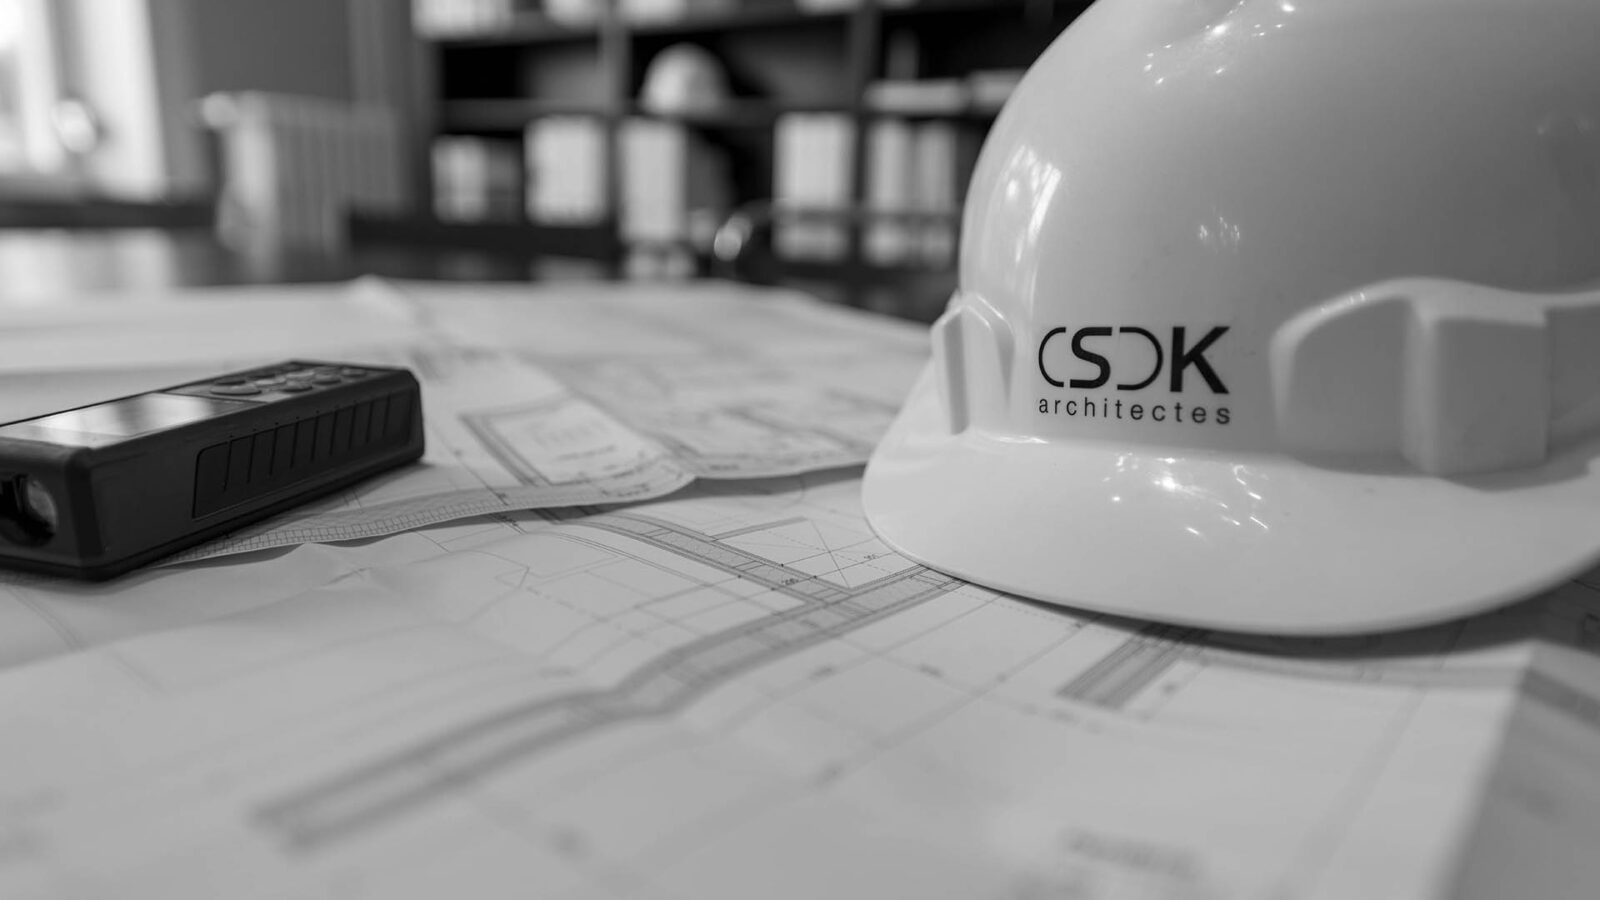 CSDK Architectes bureau darchitectes emplois 1600x900 - Offre d'emploi - CSDK Architectes bureau darchitectes emplois 1600x900